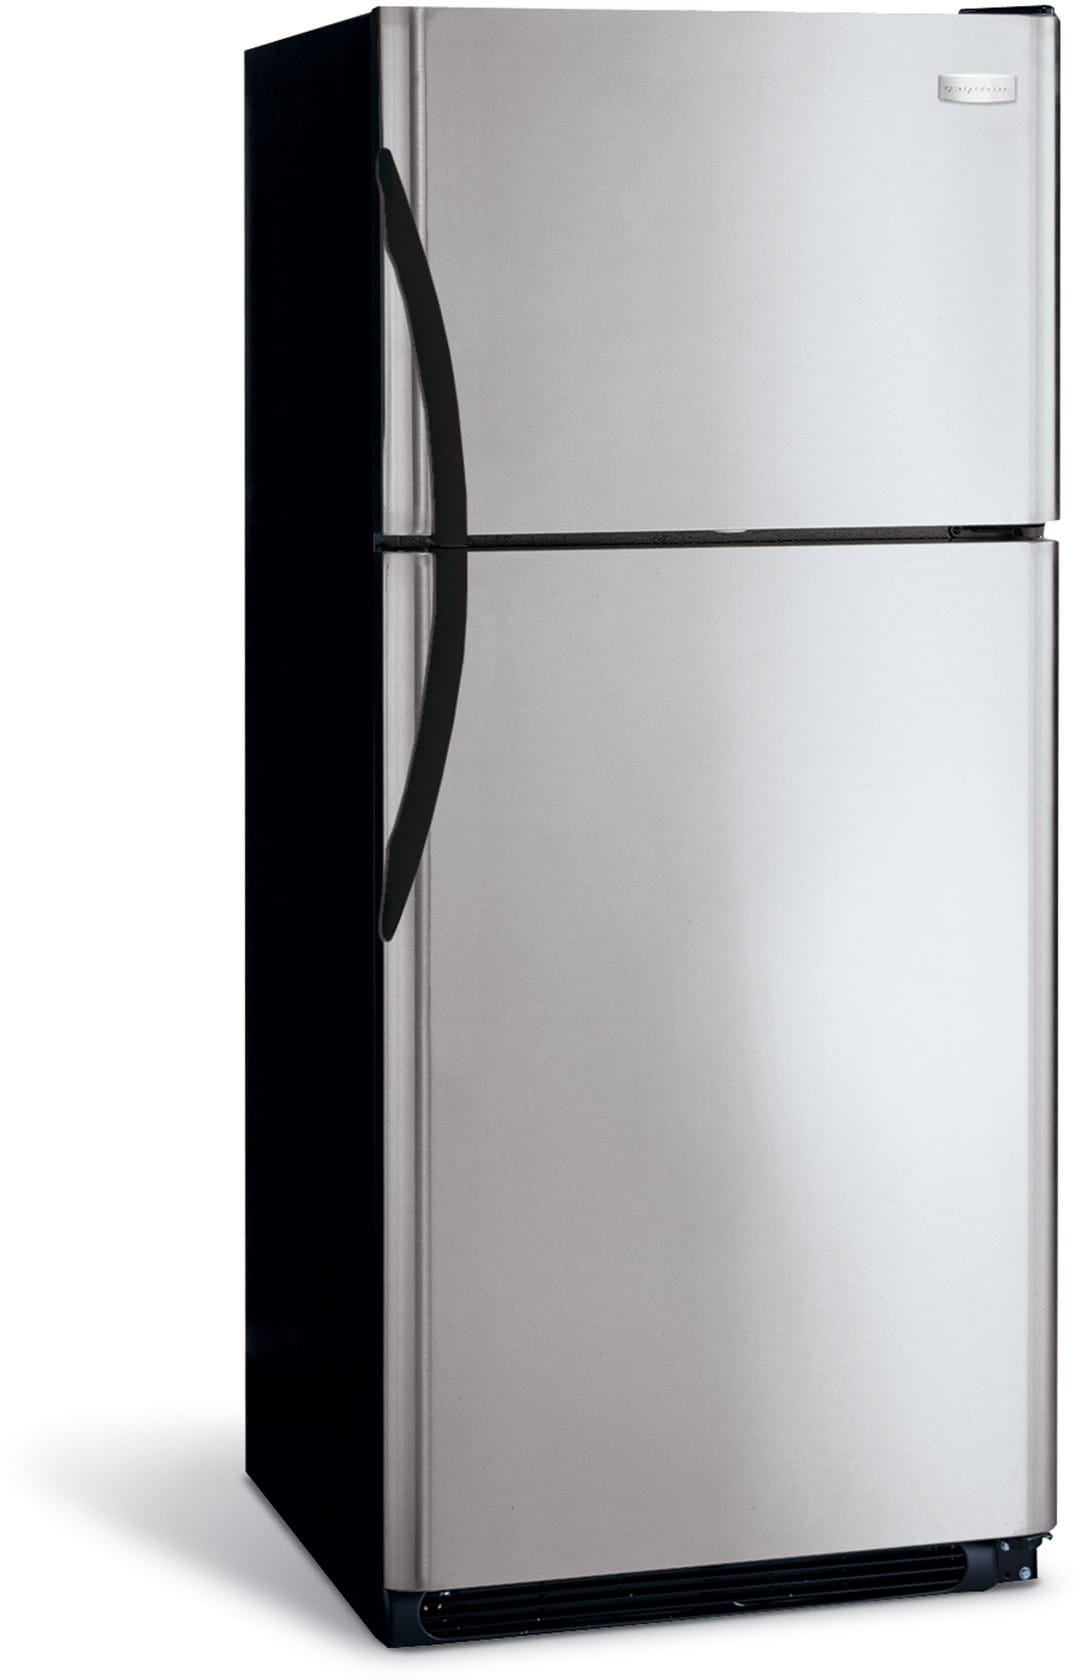 Frigidaire Frt18s6js 18 2 Cu Ft Top Freezer Refrigerator